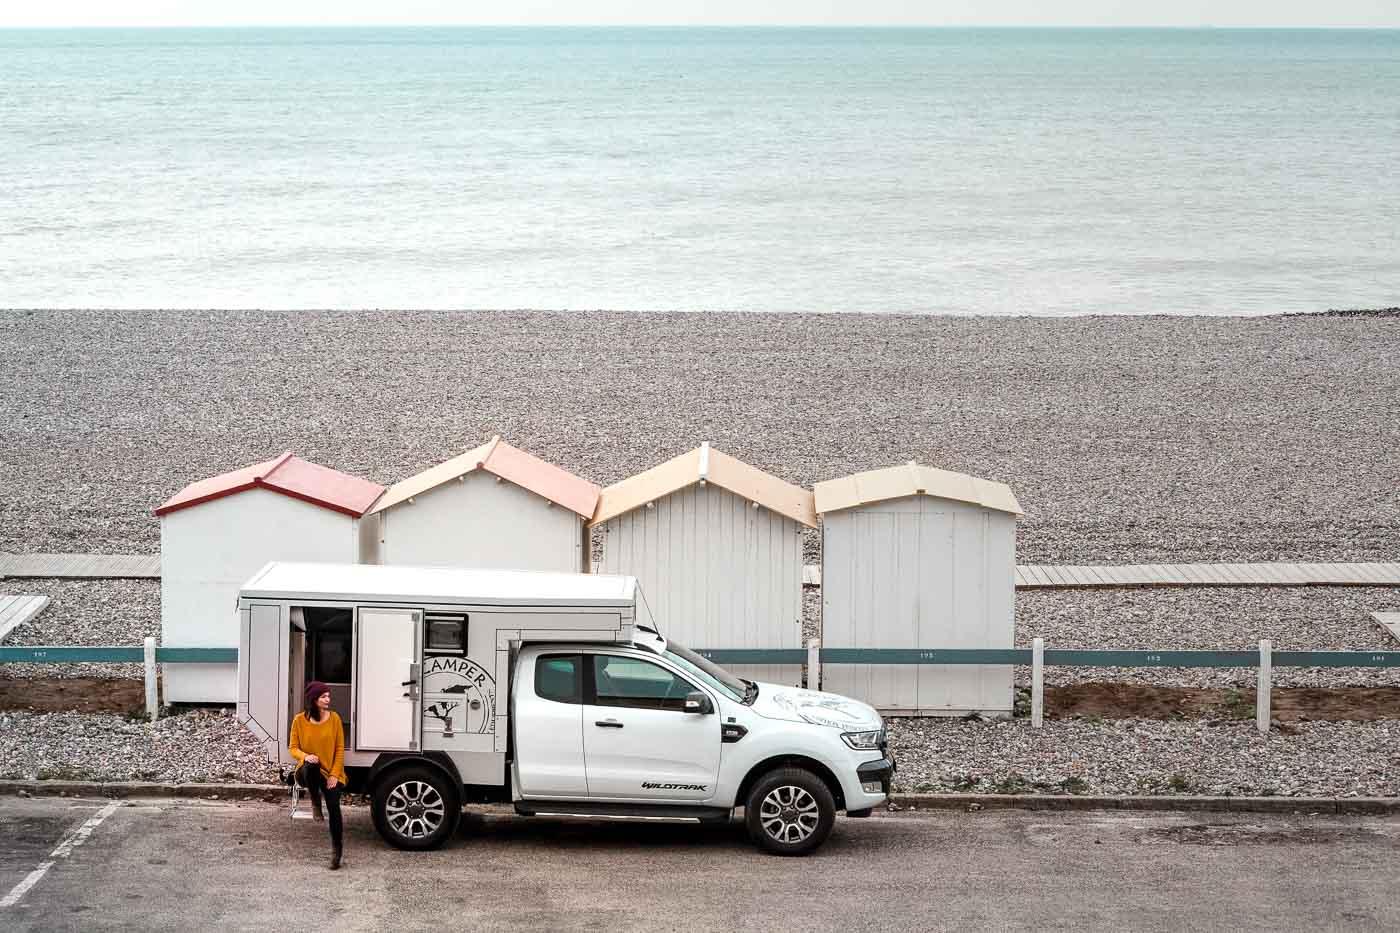 Première expérience d'un road trip en camper van